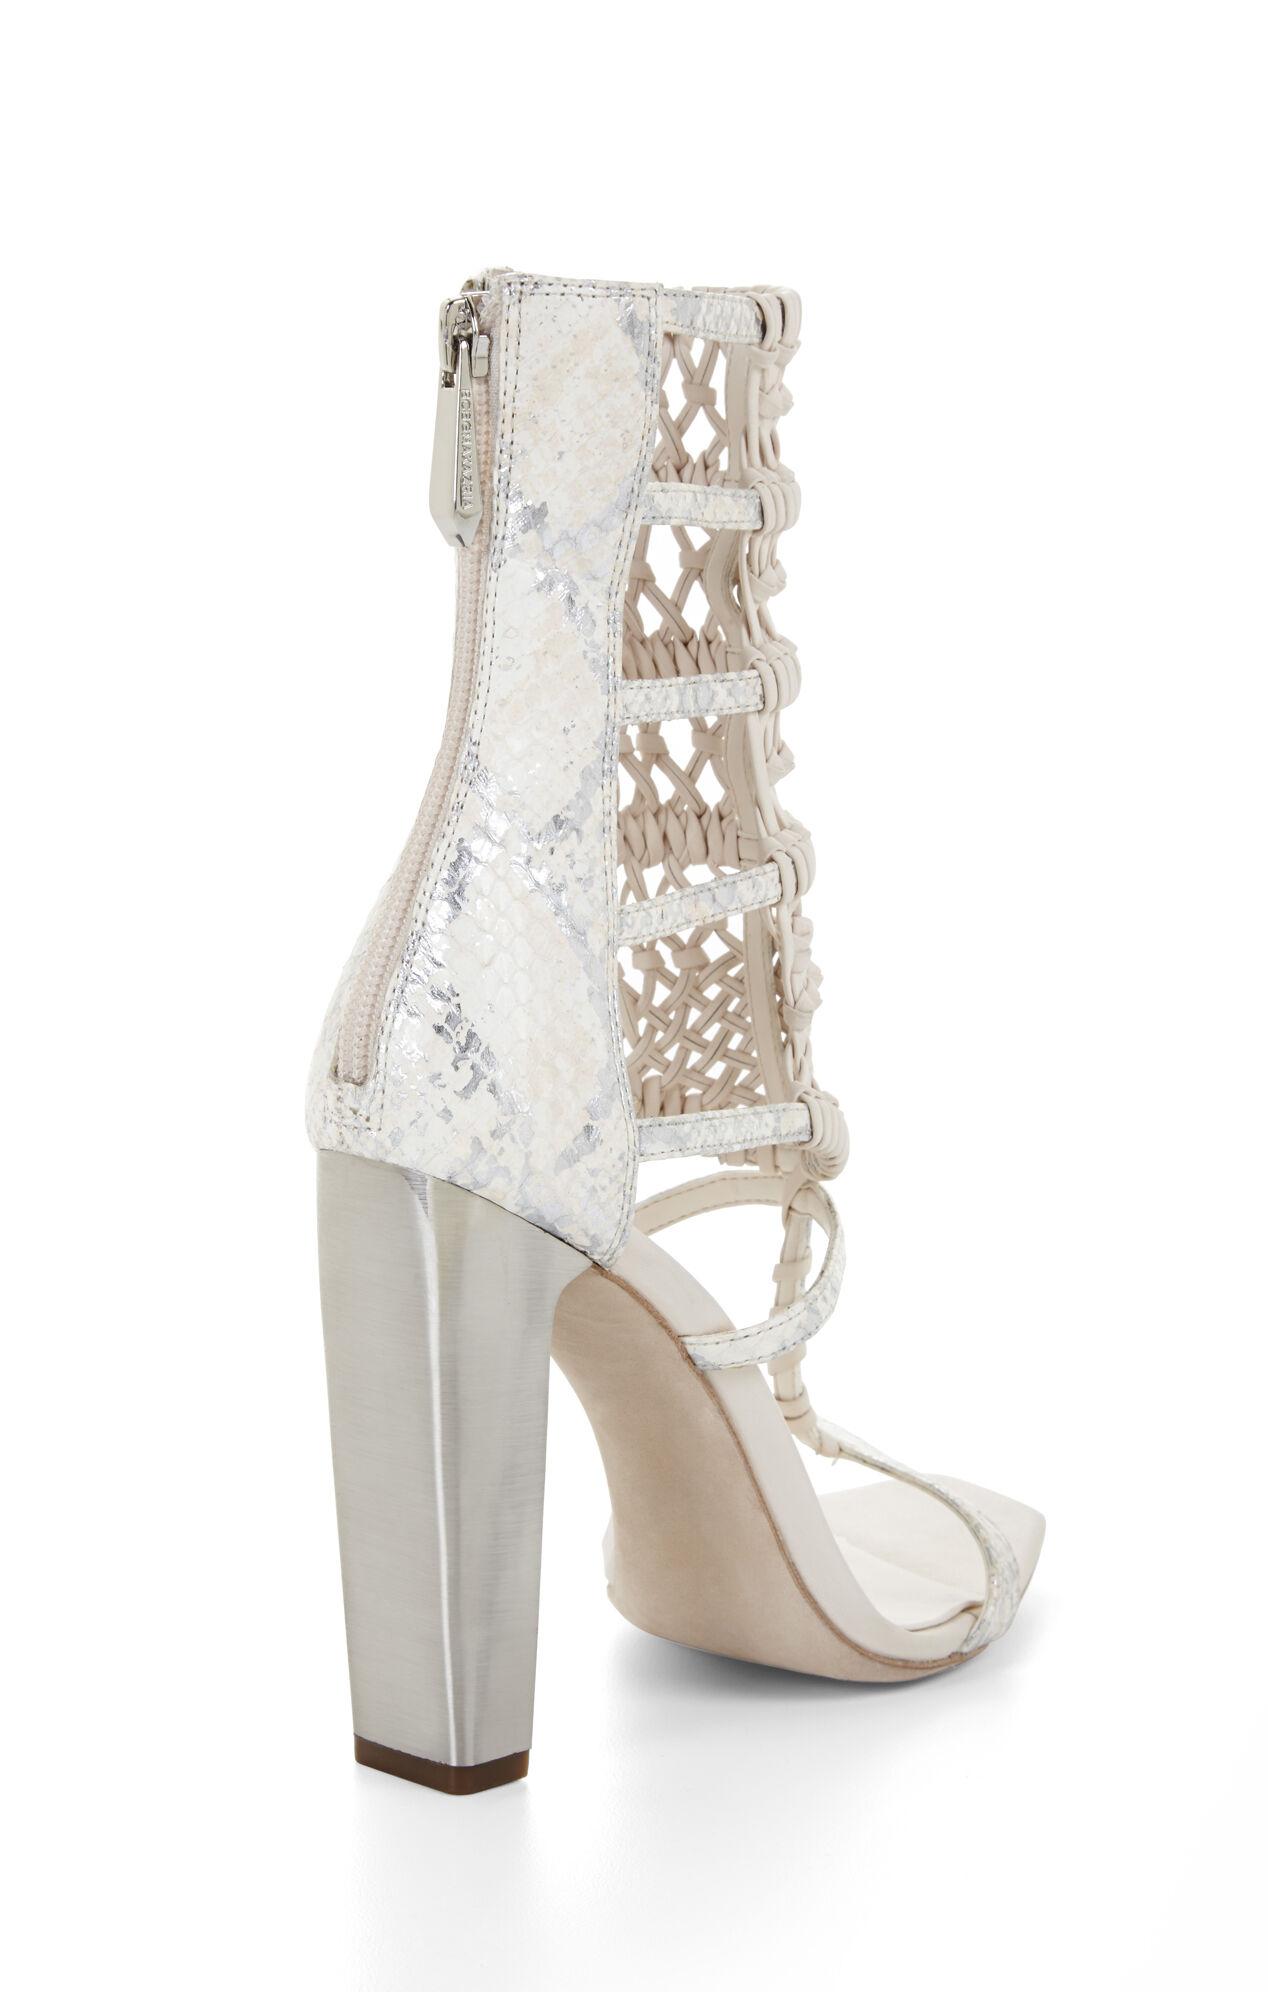 Post High-Heel Macrame Day Sandal